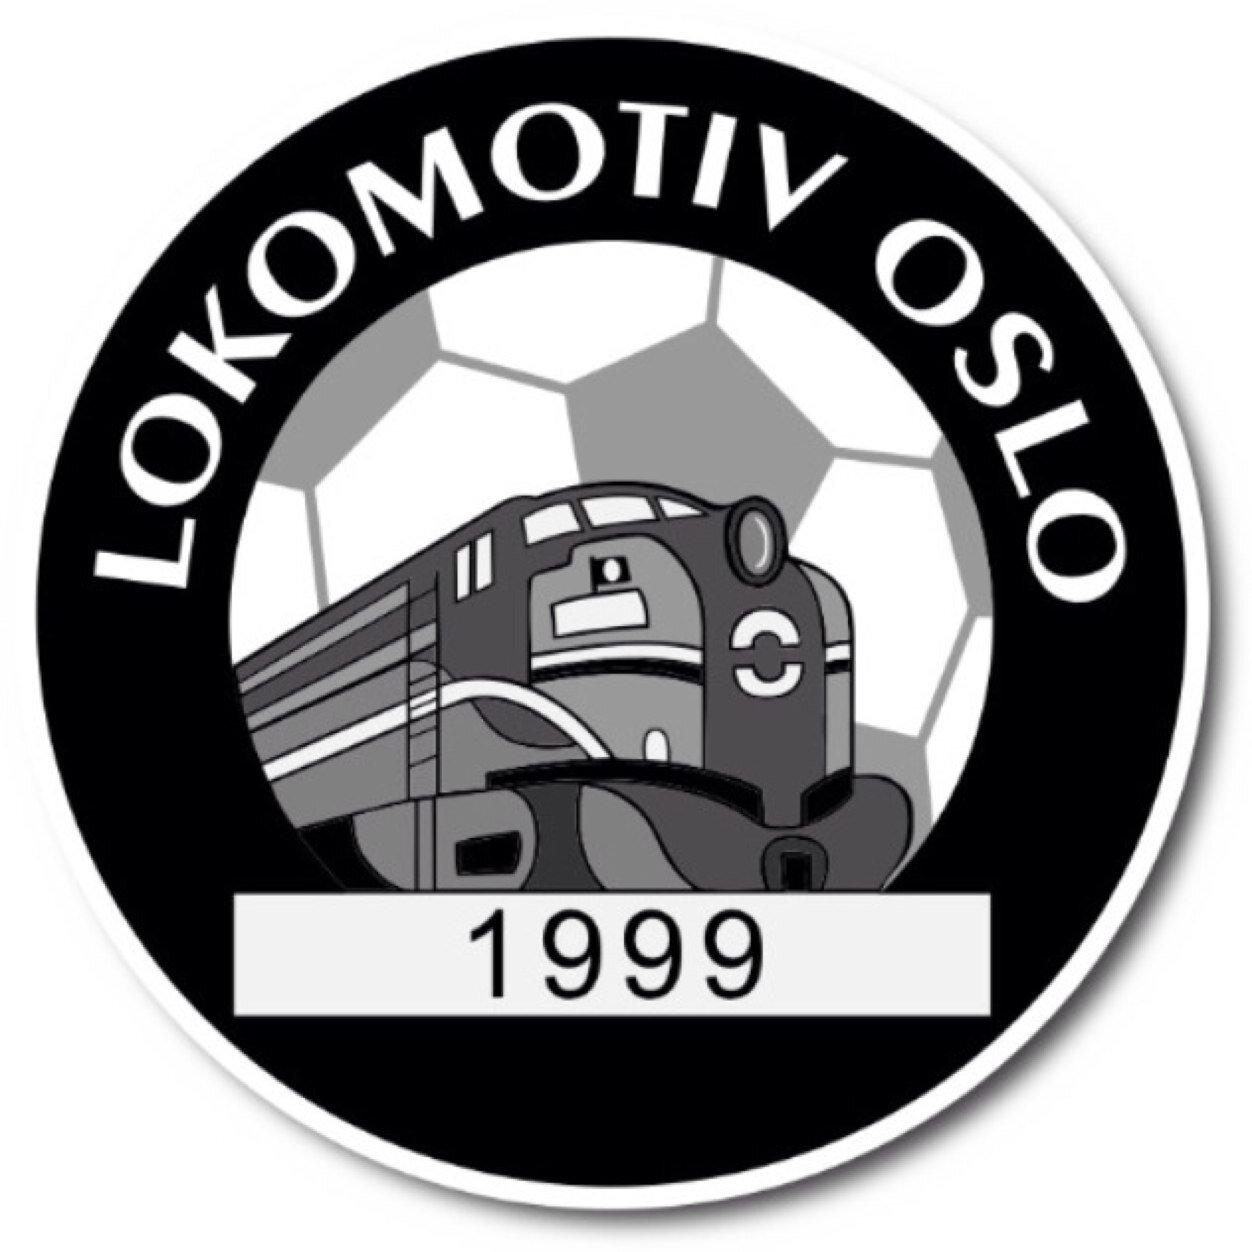 Lokomotiv Oslo